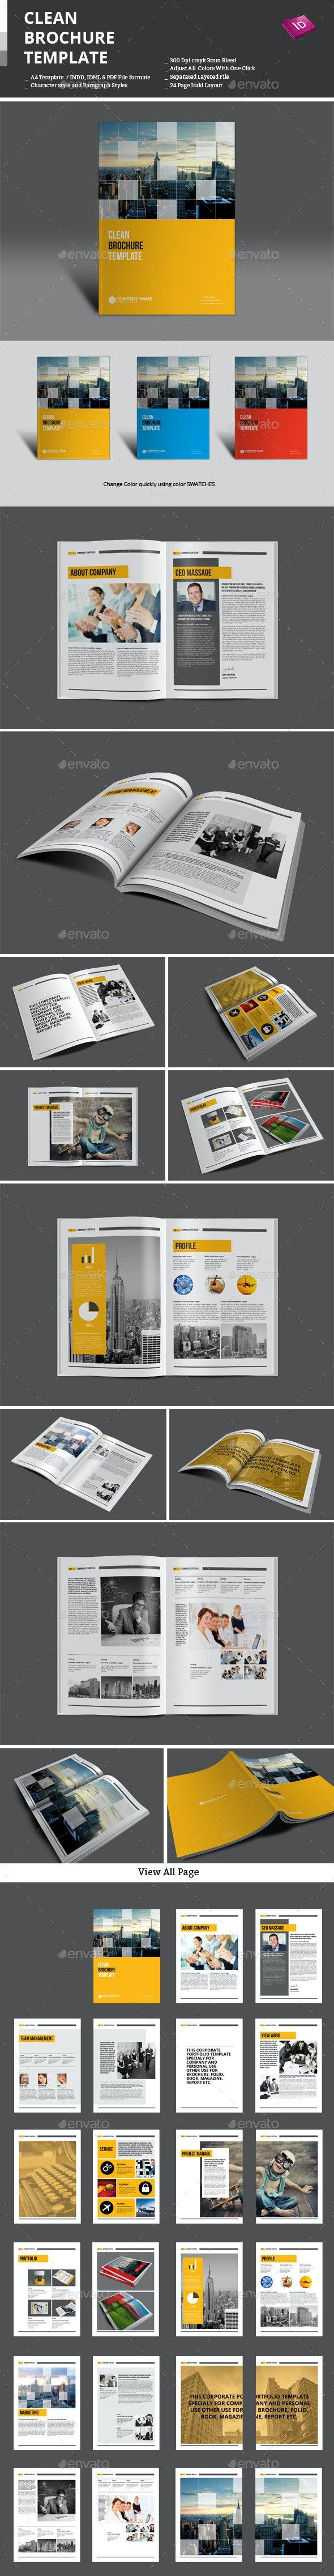 Clean Brochure Template - Corporate Brochures